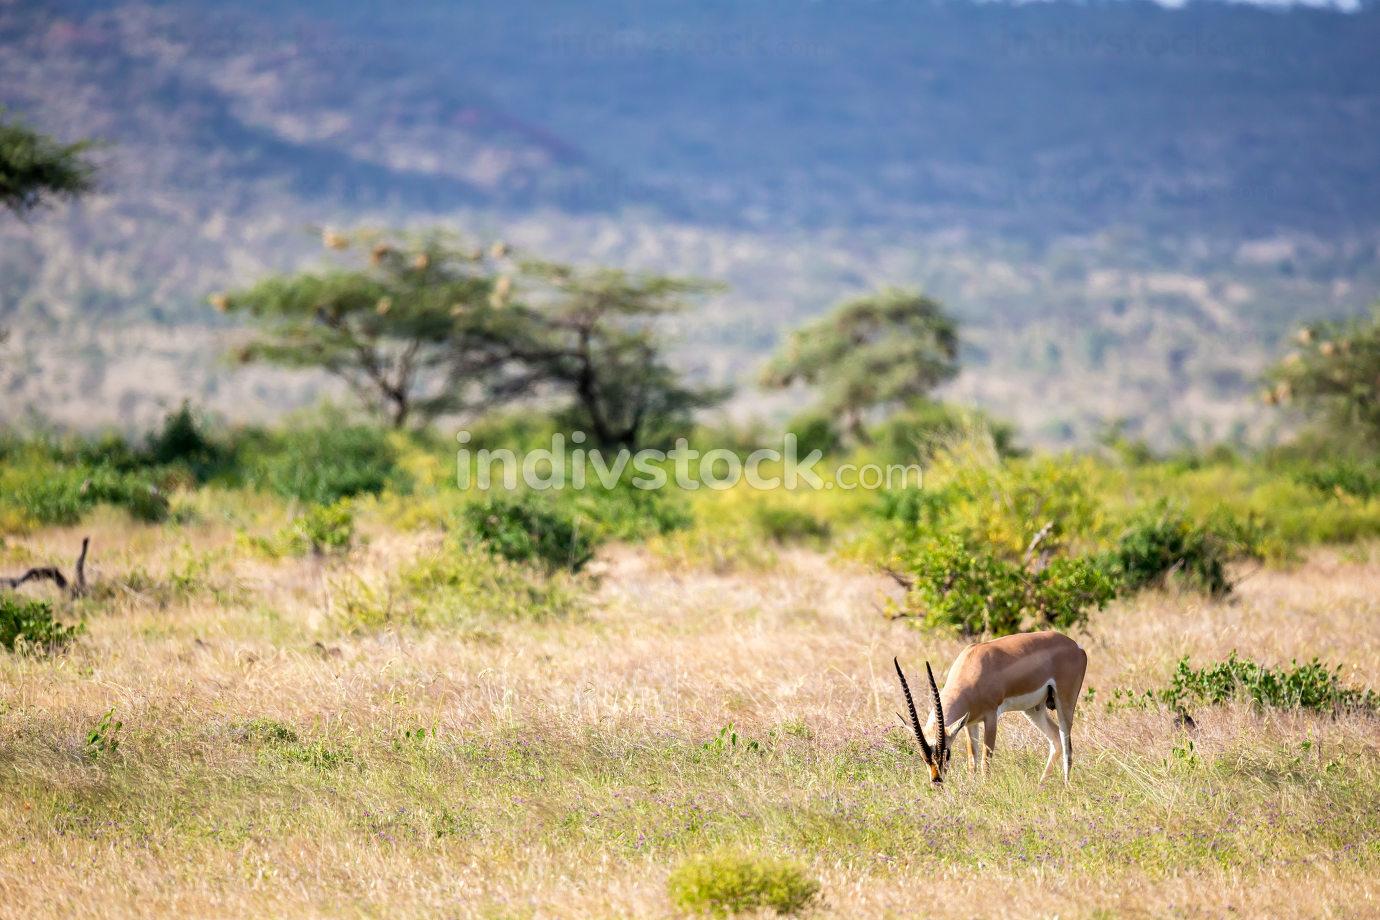 Some antelopes in the grass landscape of Kenya